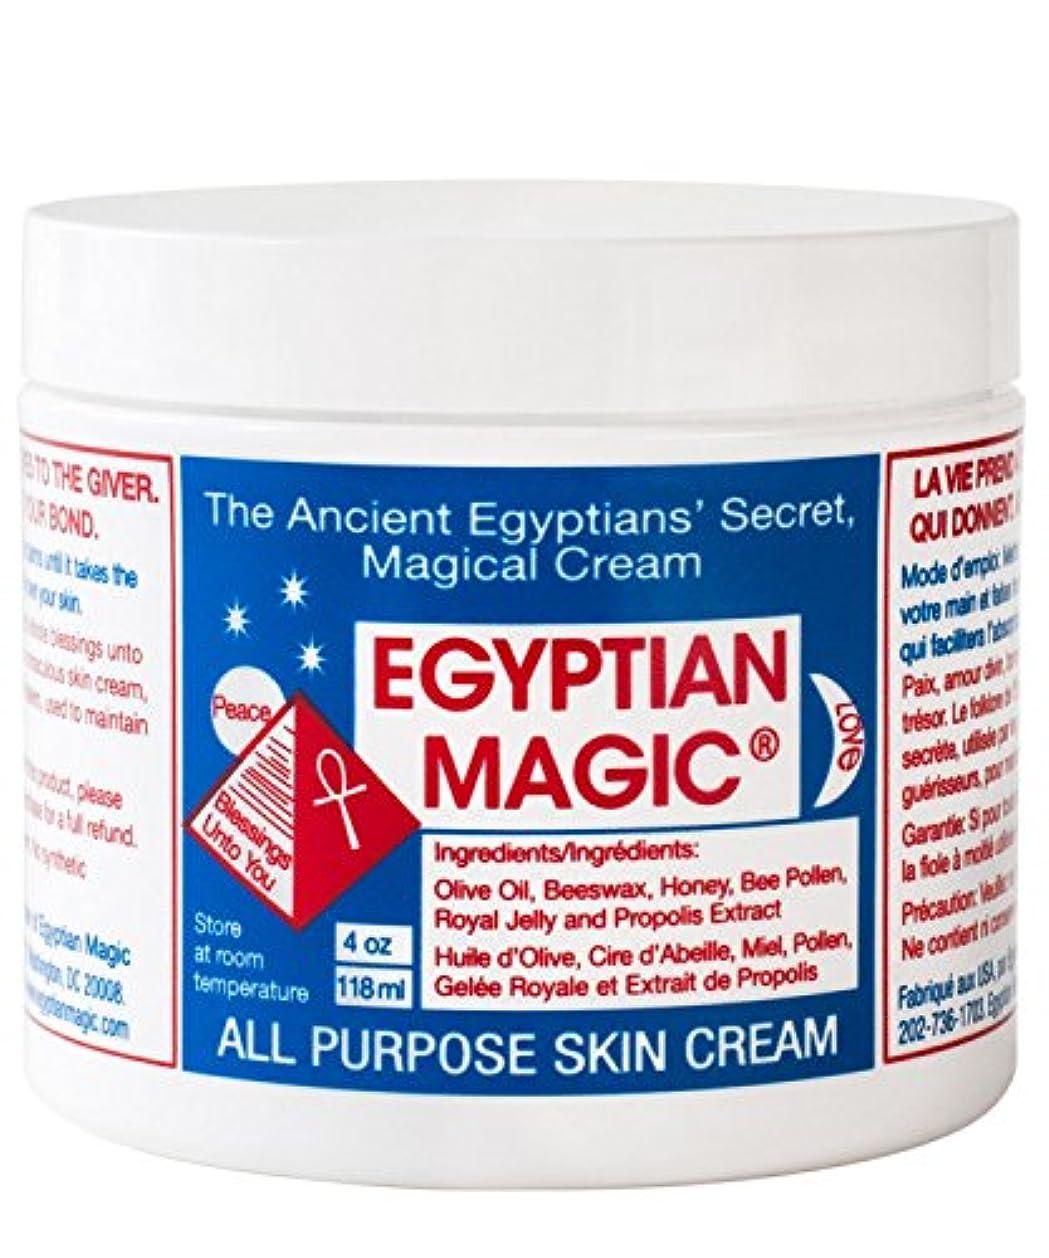 Egyptian Magic All Purpose Skin Cream 118ml (Pack of 6) - エジプトの魔法の万能スキンクリーム118ミリリットル x6 [並行輸入品]